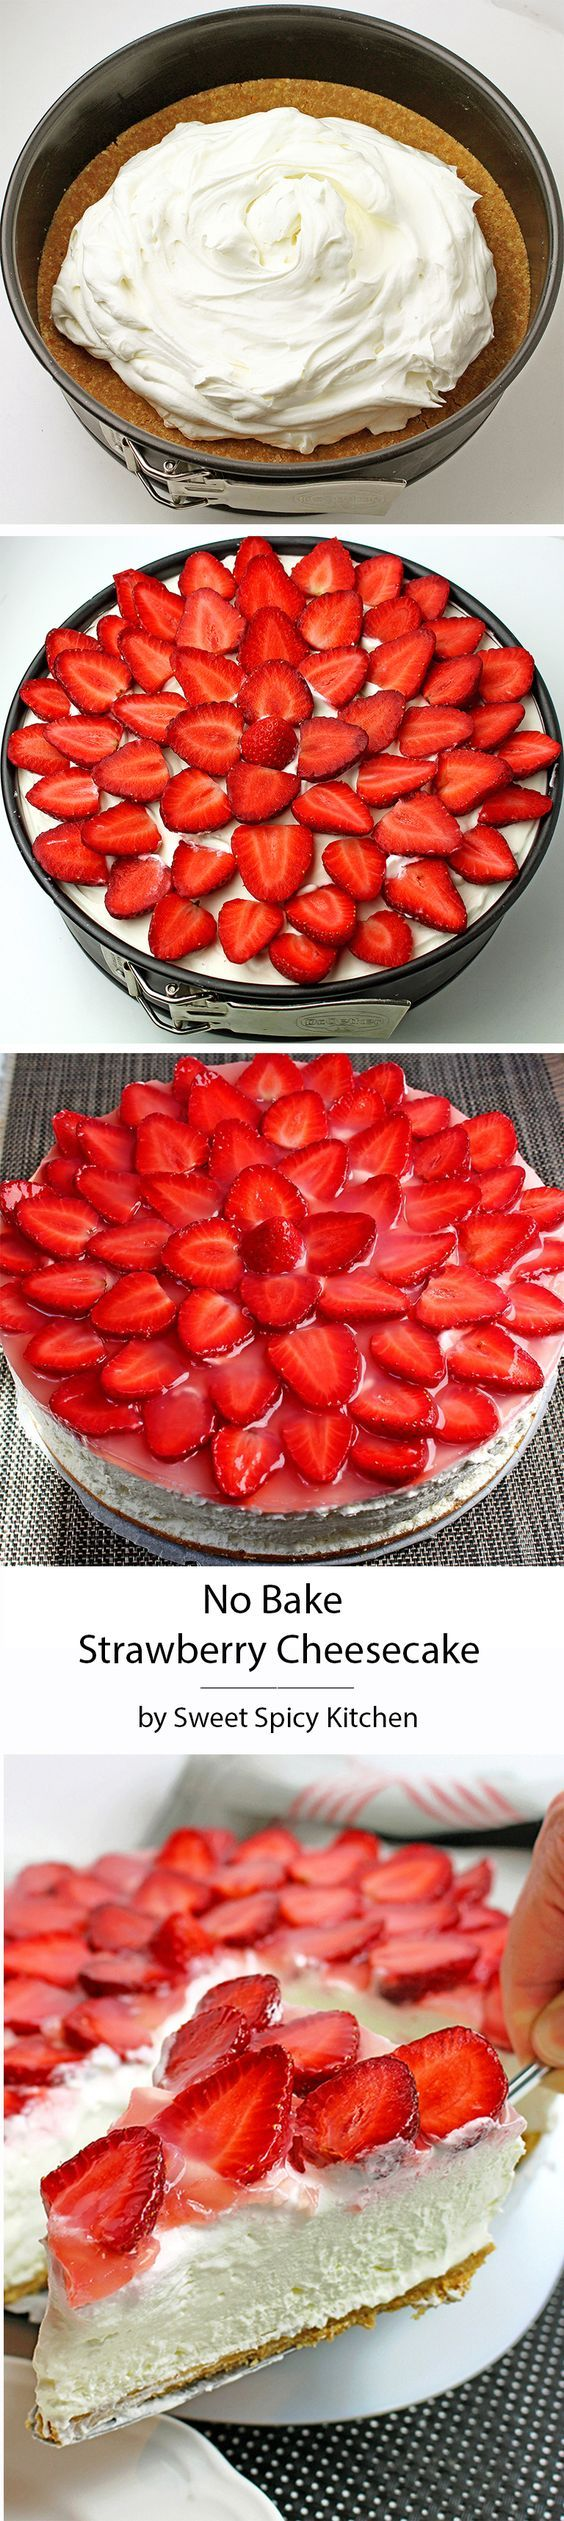 Easy No Bake Strawberry Cheesecake recipe is a perfect homemade dessert rich with graham cracker crust,cream cheese,lemon juice and fresh&juicy strawberries